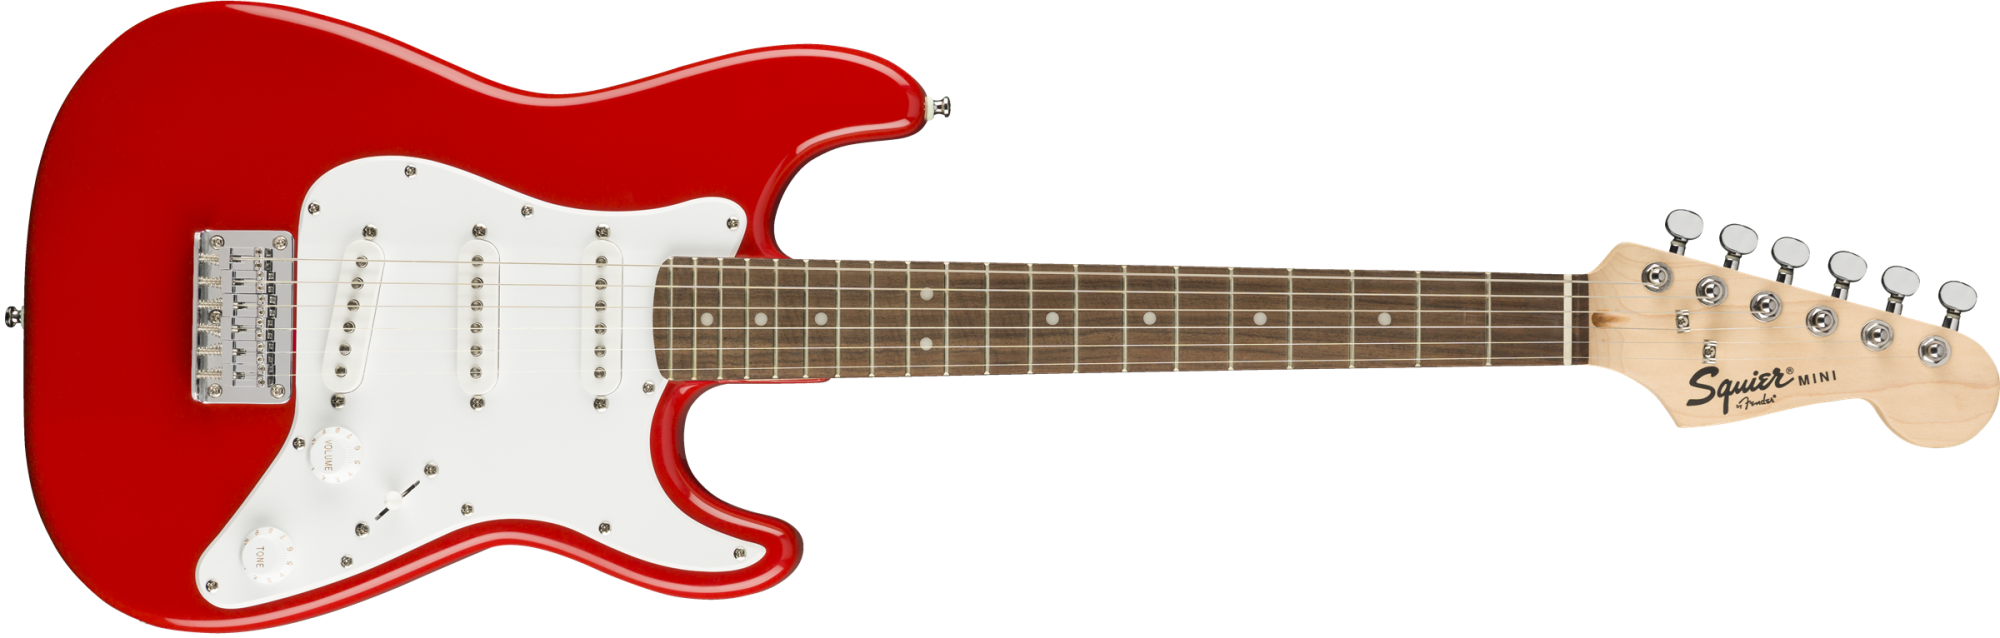 Squier Mini Strat, Laurel Fingerboard, Torino Red